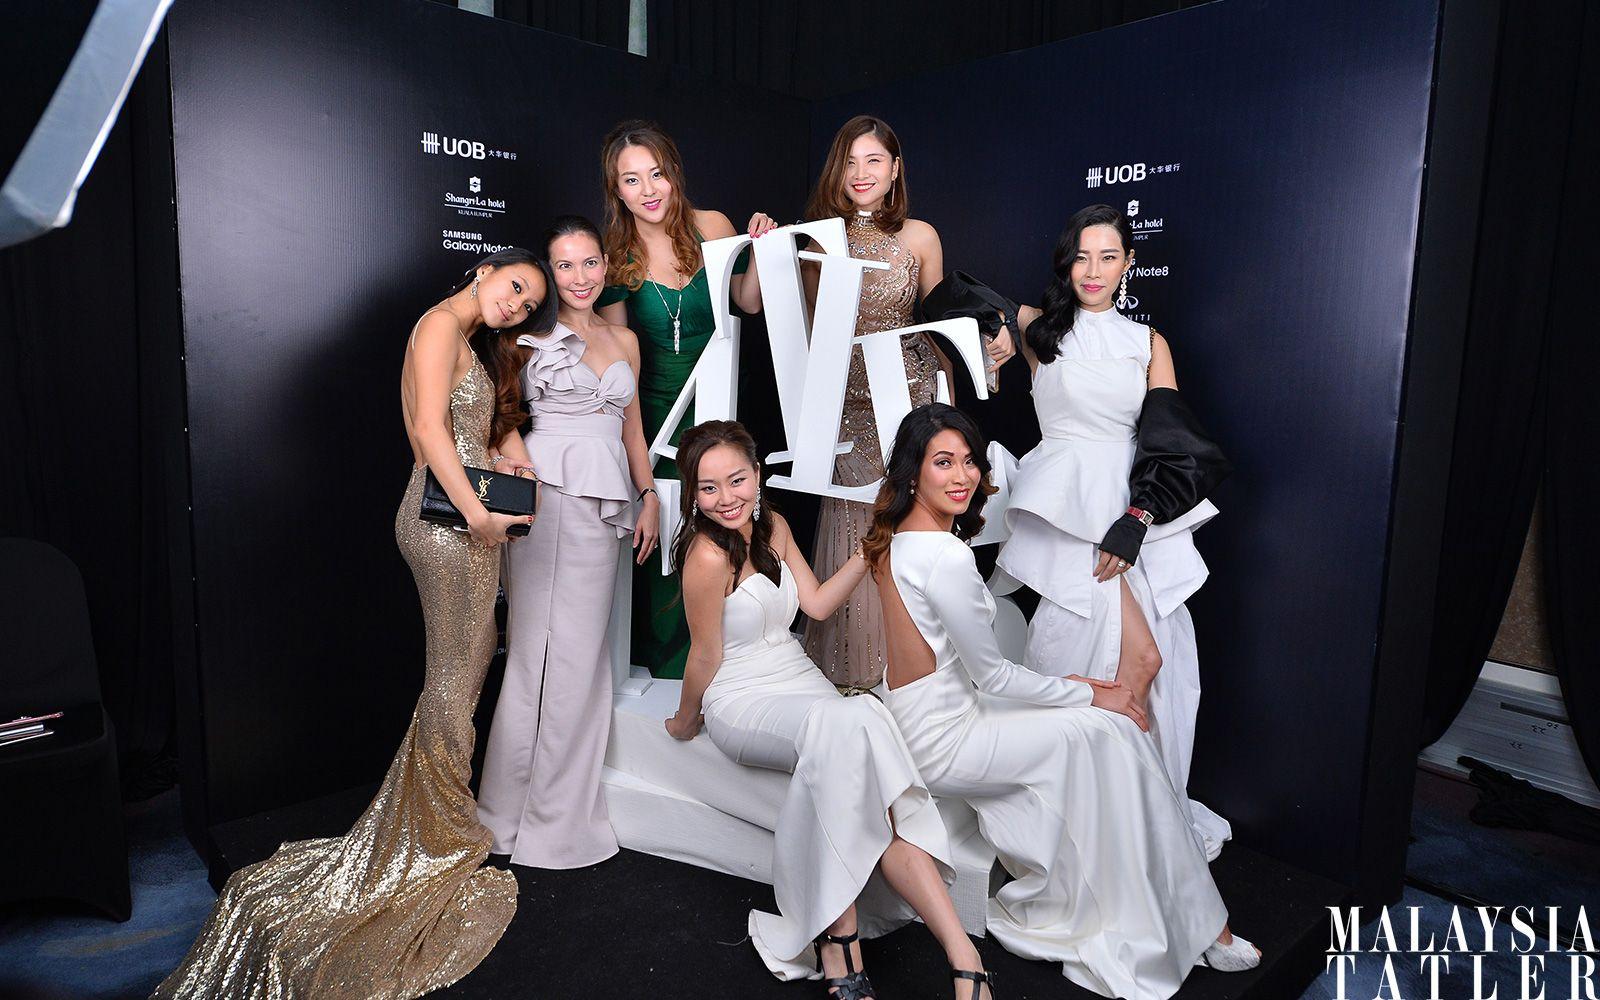 Rebekah Yeoh, Geraldine Dreiser, Valerie Ong, Jady Teoh, Valene Tan, Dr Andrea Lim and Levy Li